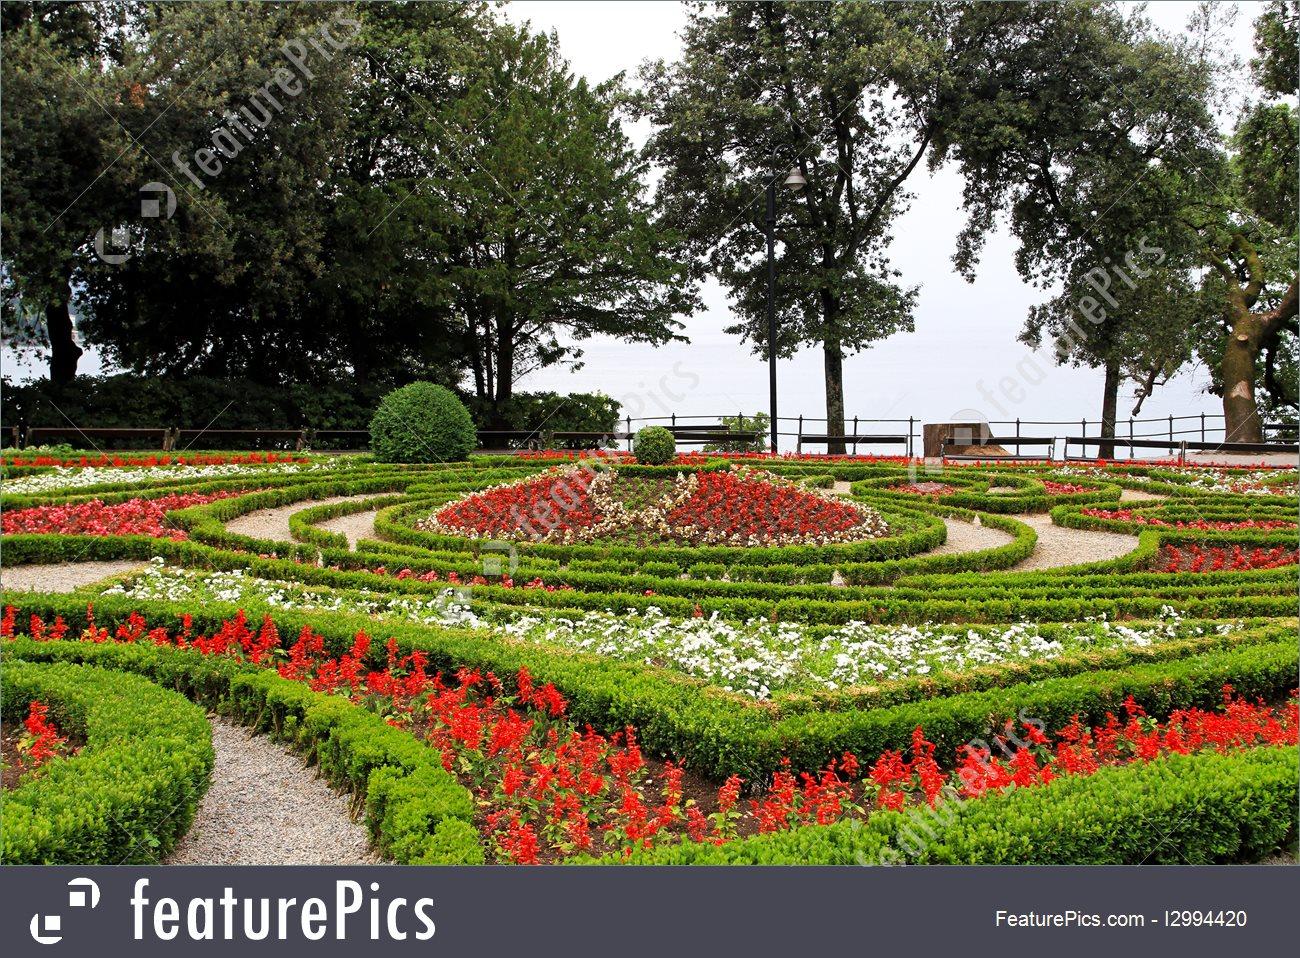 Opatija Flower Park Image.